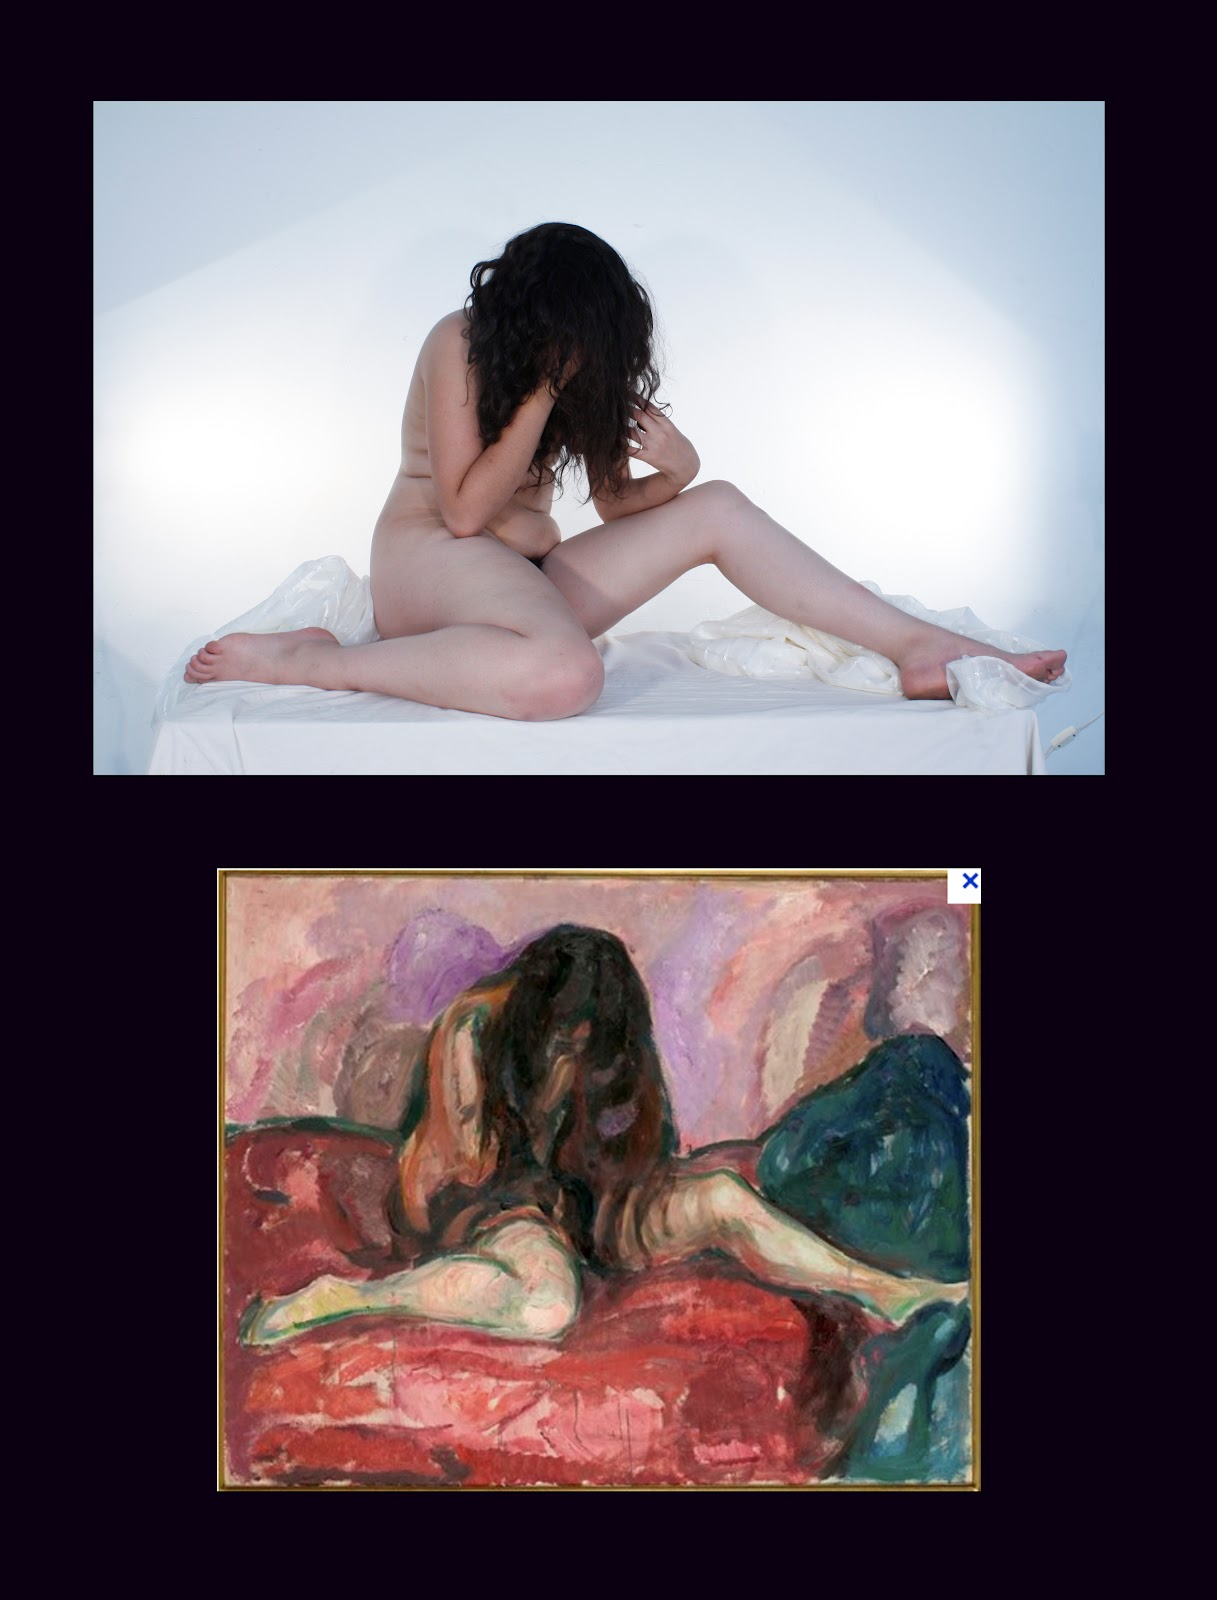 http://2.bp.blogspot.com/-sWrRRYymOuQ/T9Vx2iPNPGI/AAAAAAAAAO4/vjF6zTrCsLs/s1600/Evard+Munch+1.jpg